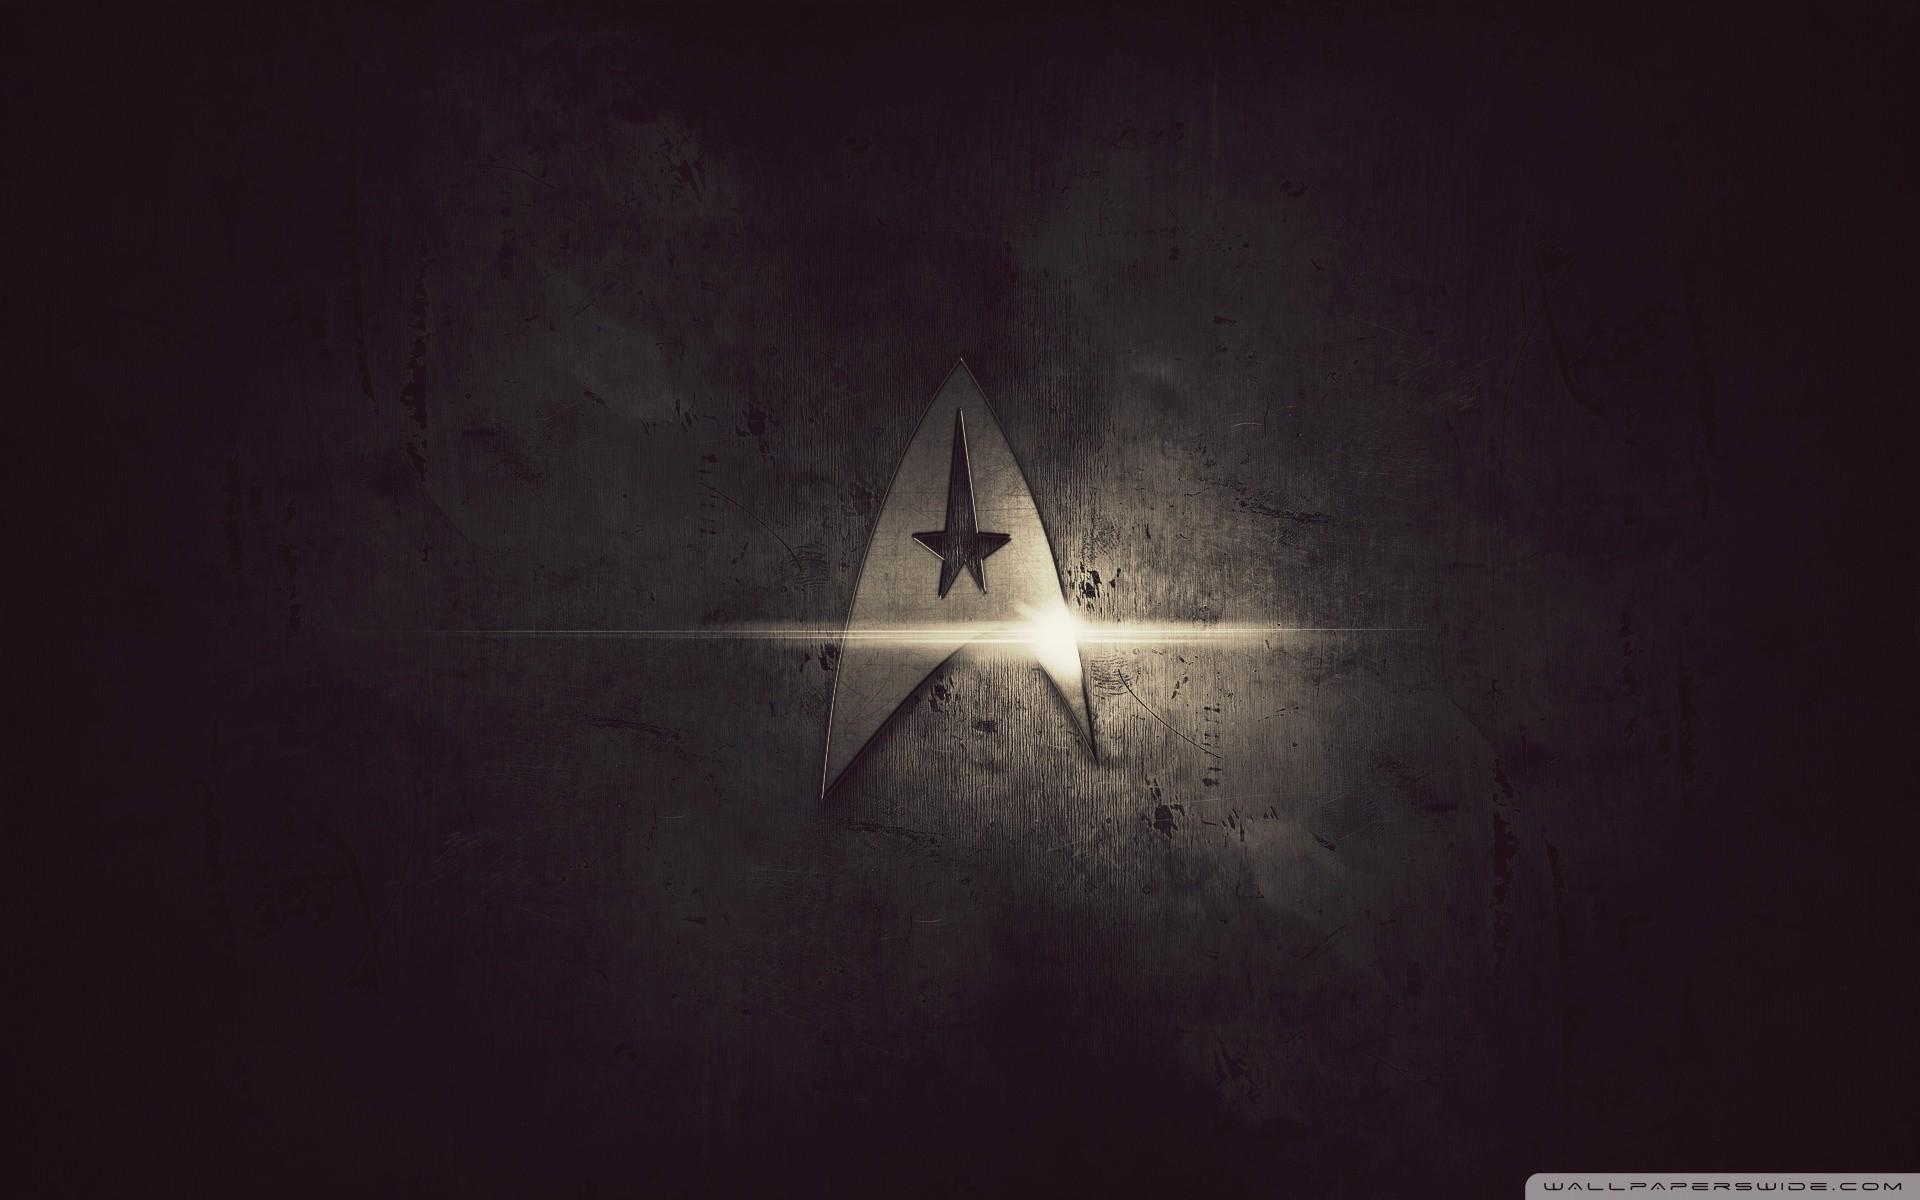 Heavy Metal Star Trek HD Wide Wallpaper for Widescreen